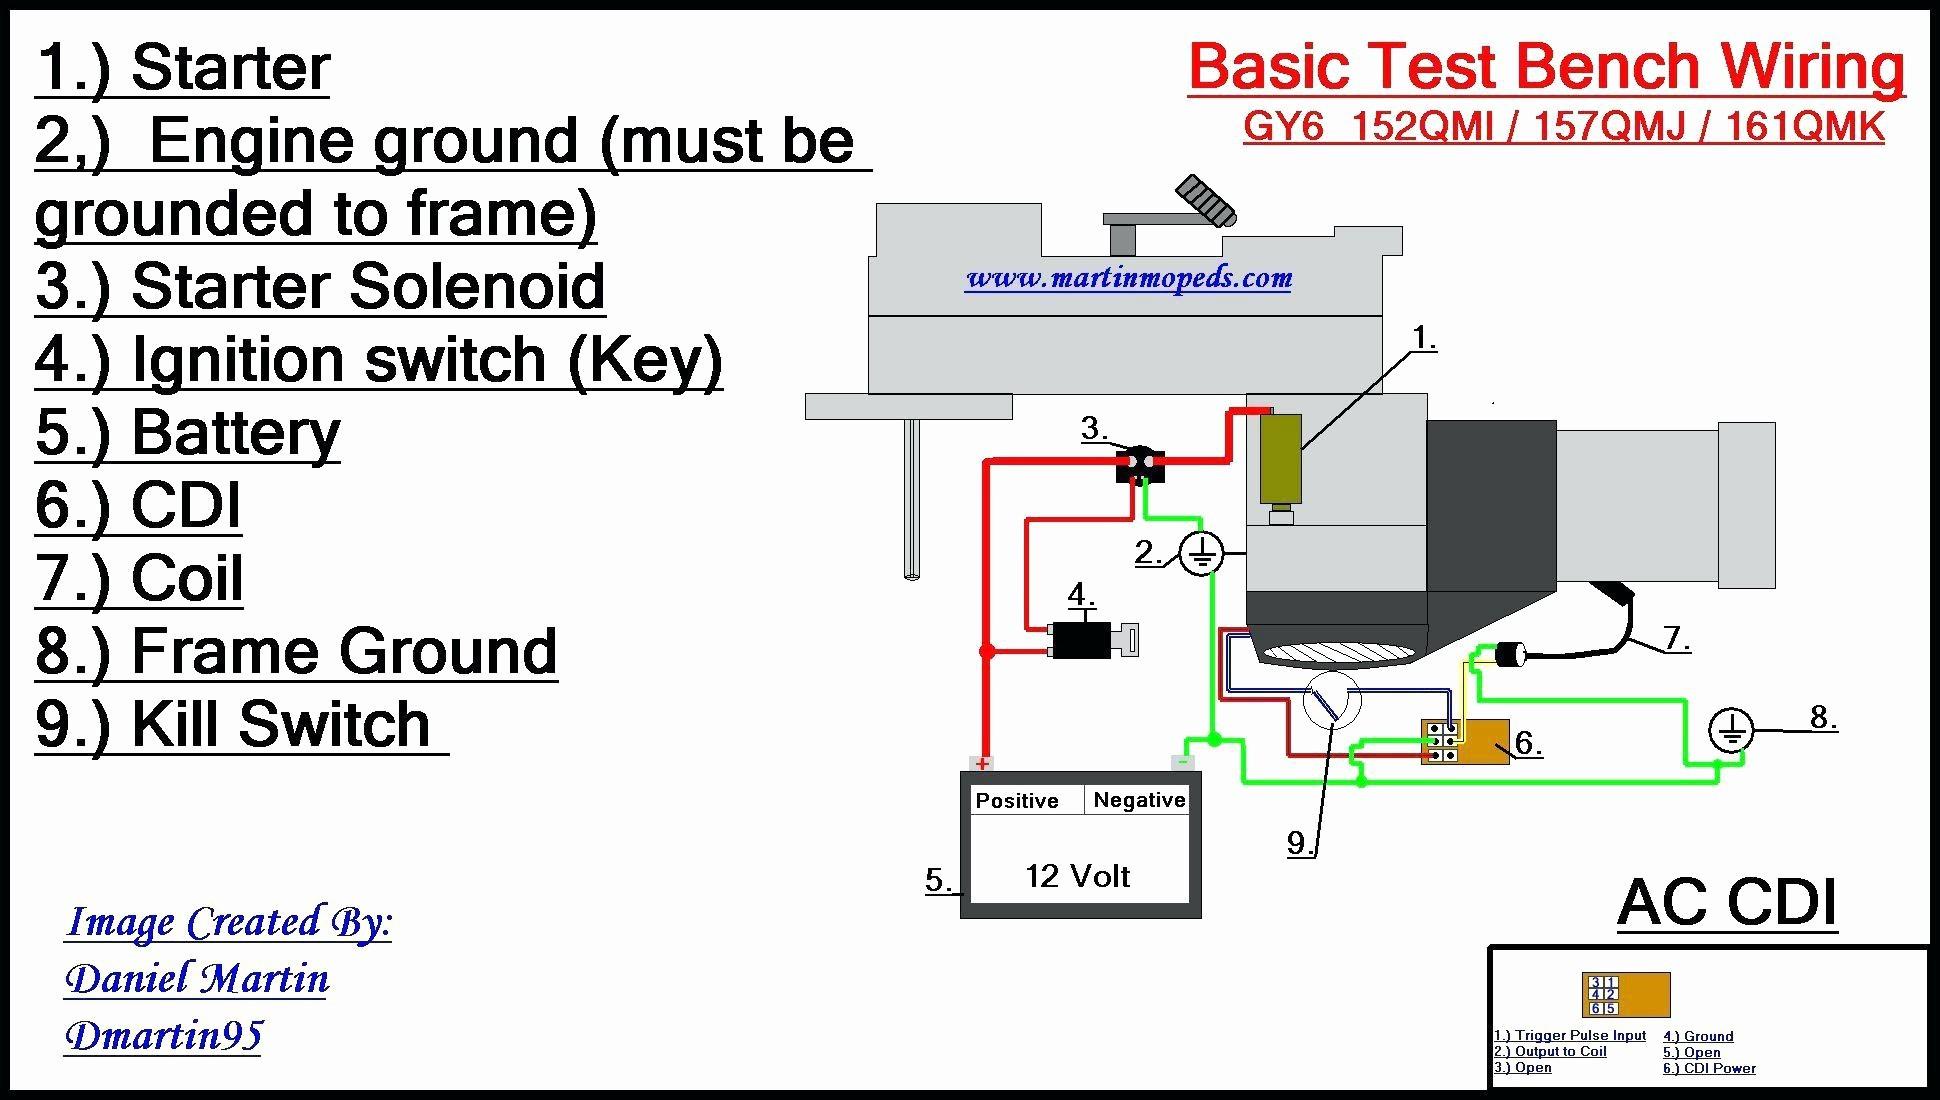 6 wire cdi diagram kawasaki enthusiast wiring diagrams u2022 rh rasalibre co kawasaki wind 125 cdi wiring diagram kawasaki barako 175 cdi wiring diagram